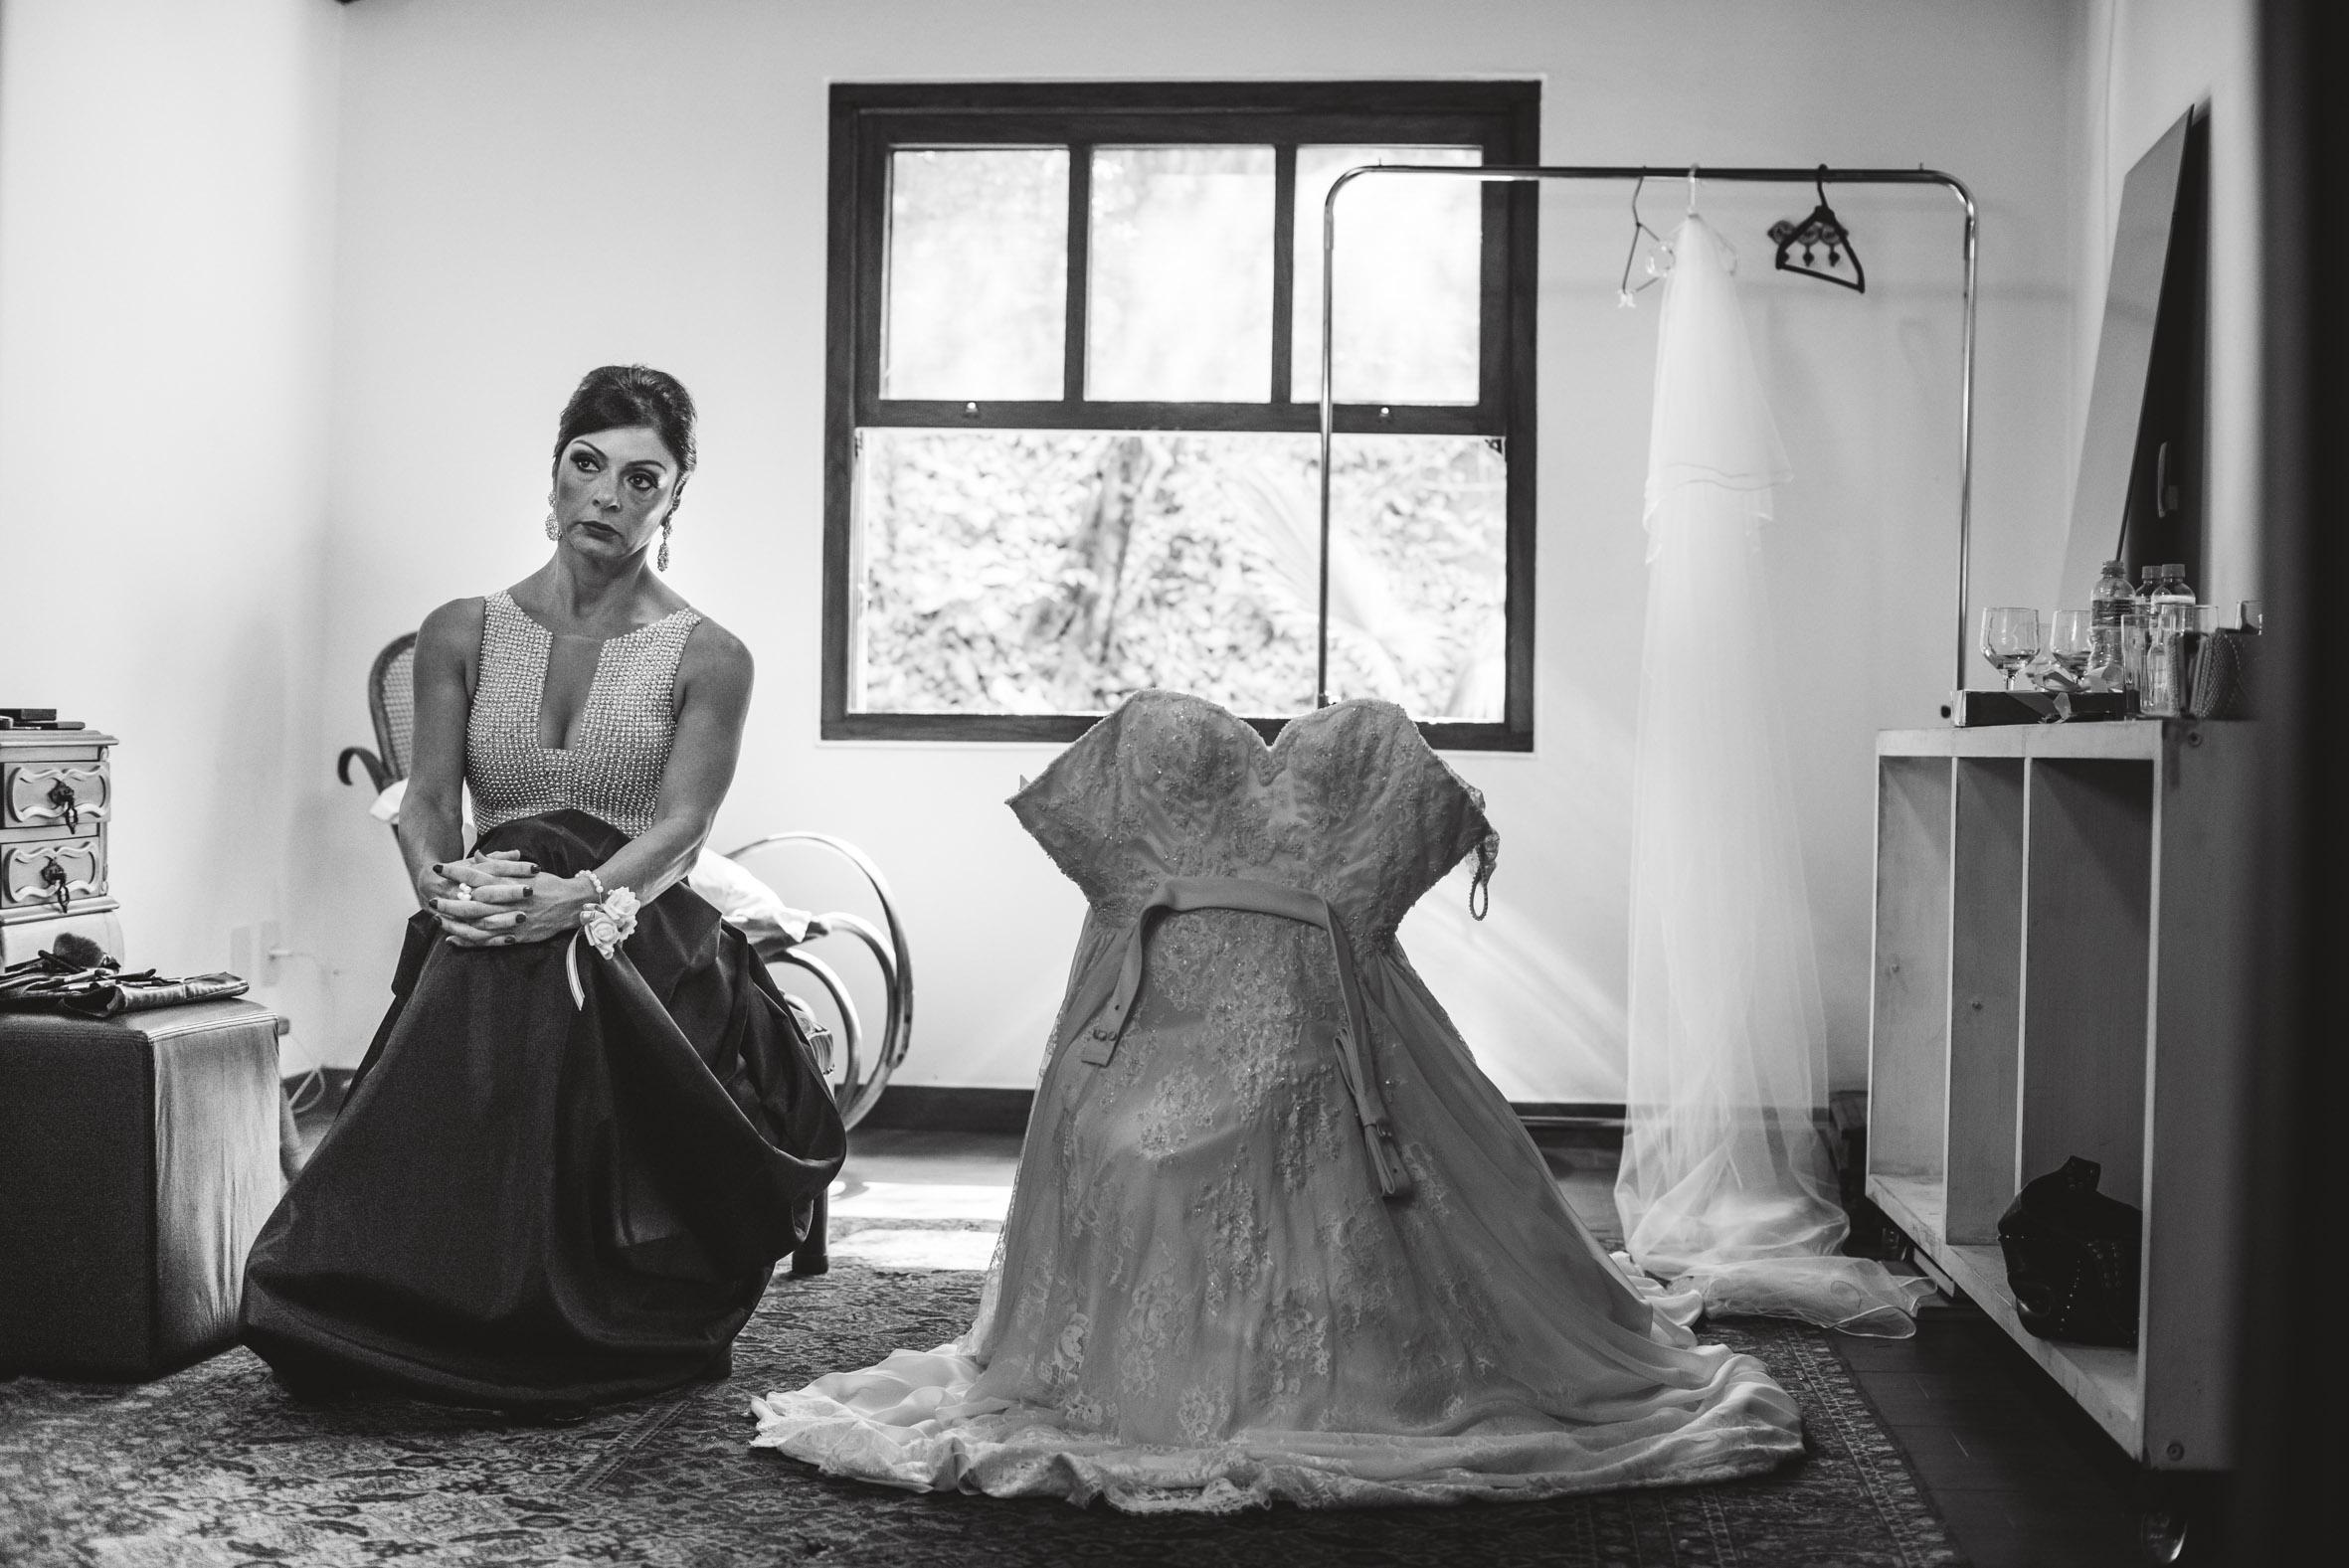 Fotografia de casamento, festa, noivos, cerimonia, vestido, ensaio, making of, noiva, véu, sapato, noivo, brinco, mãe